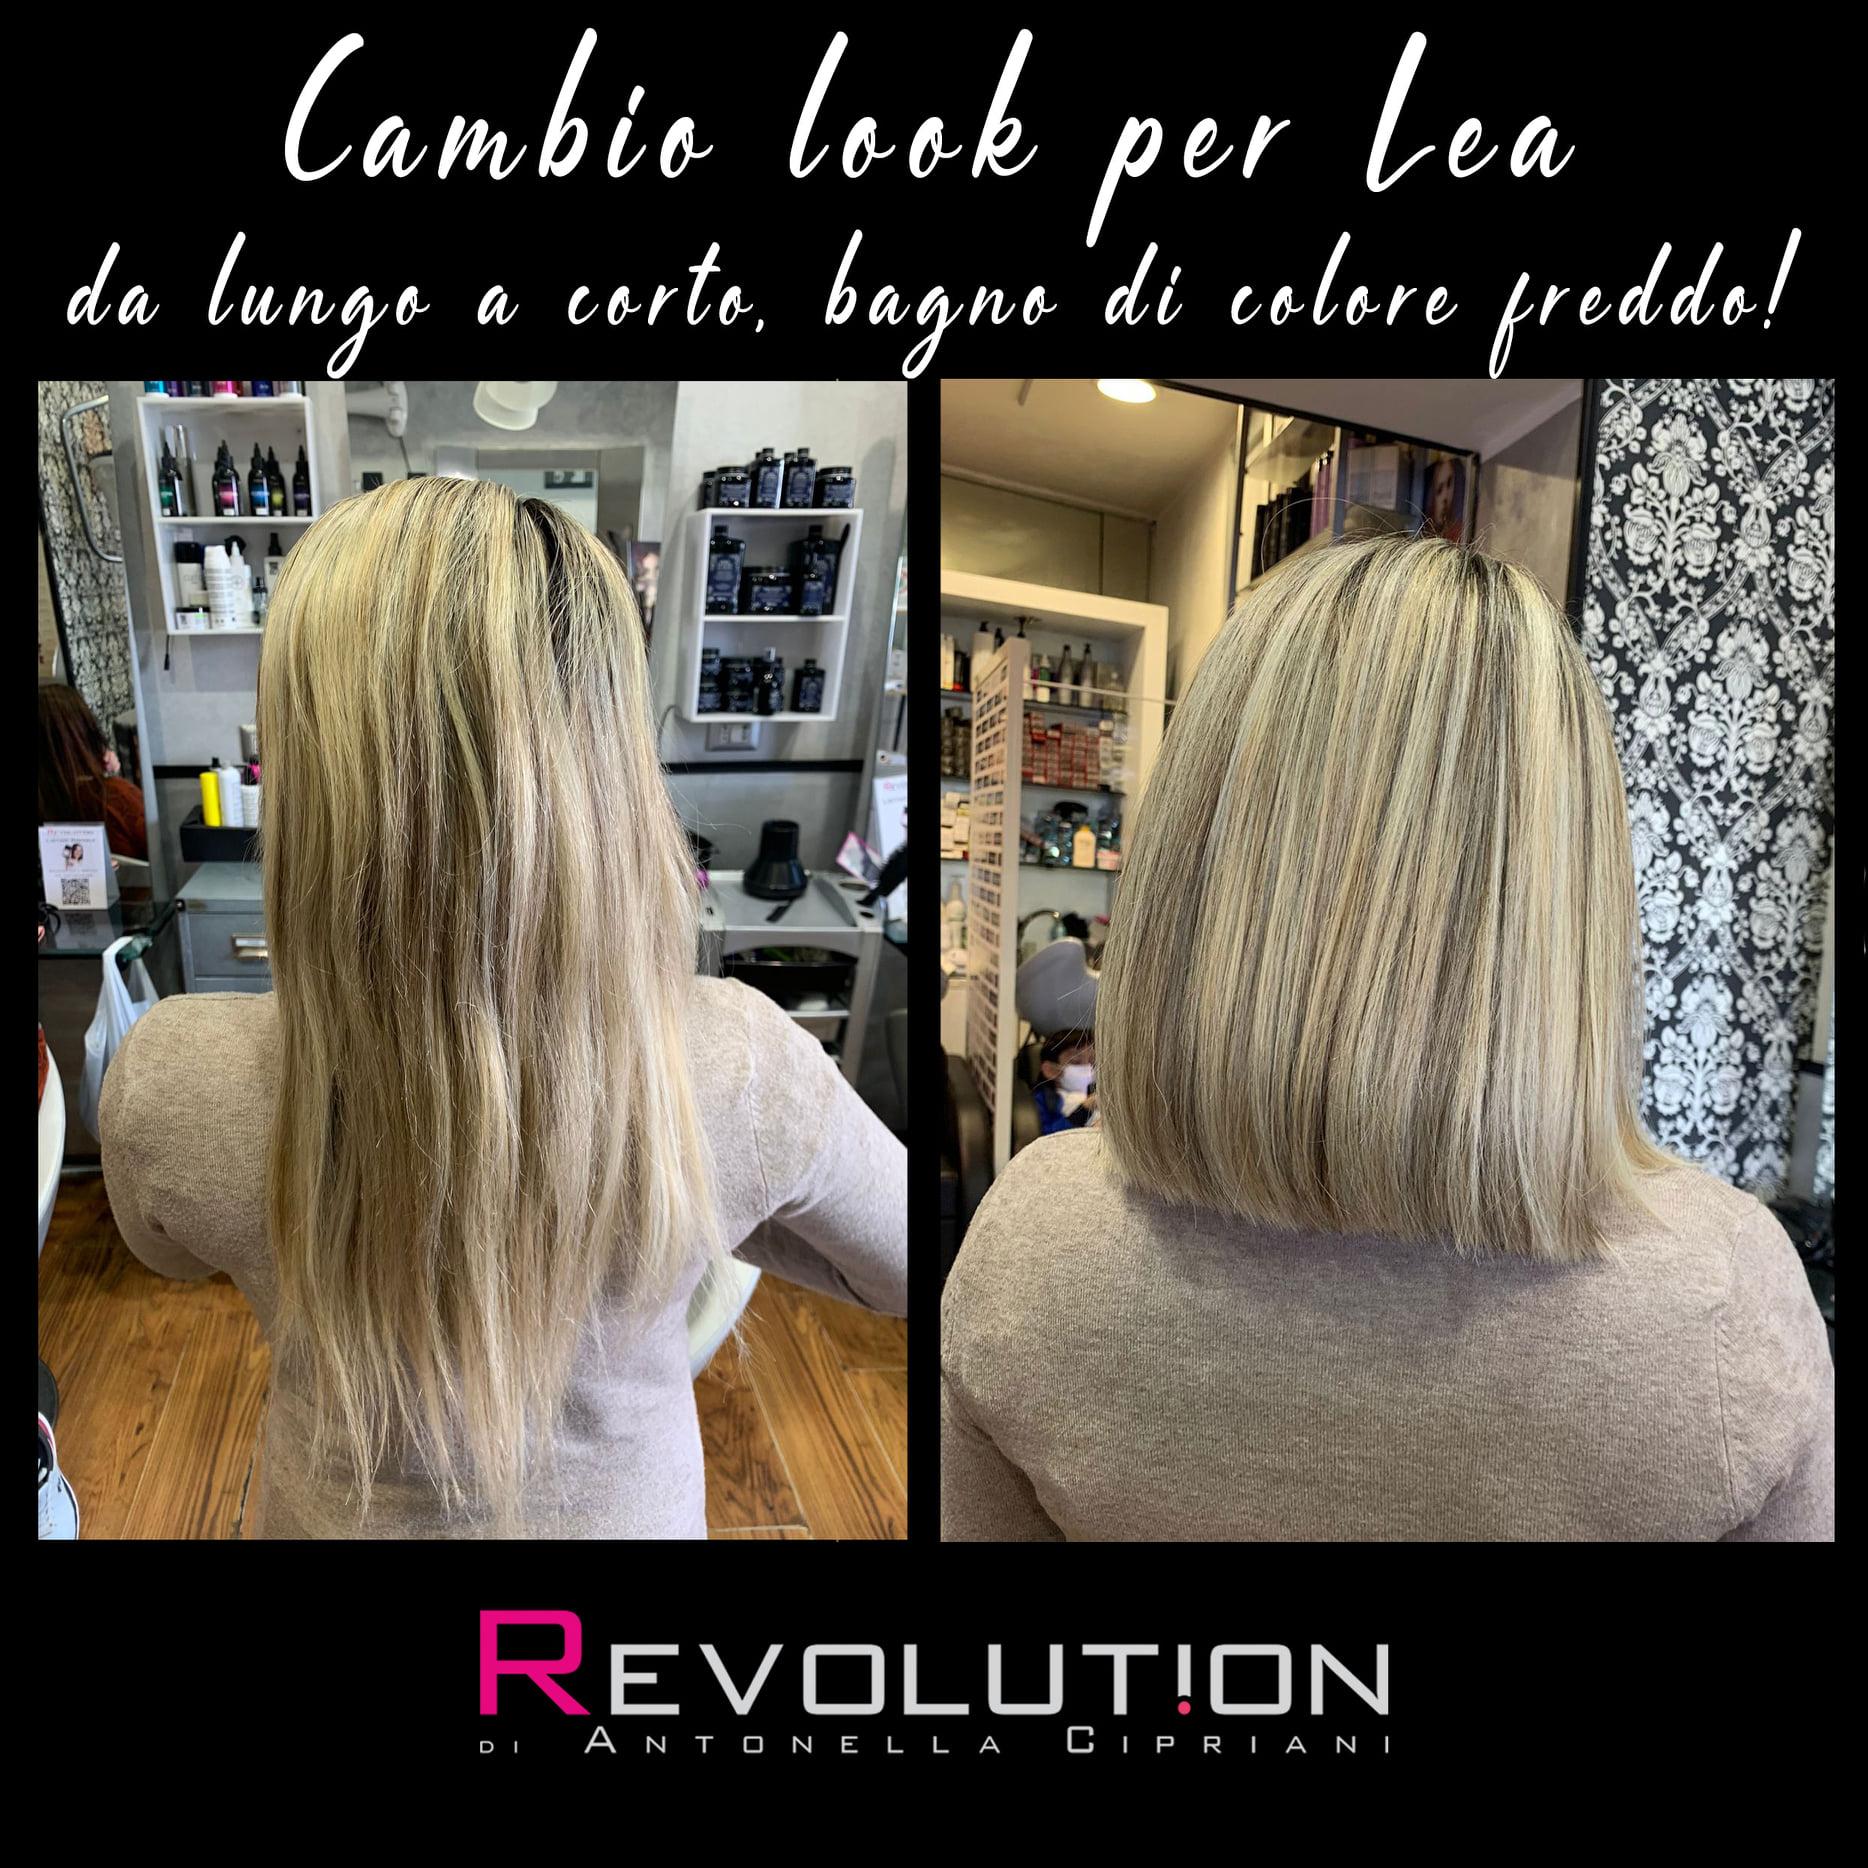 Cambio look per Lea